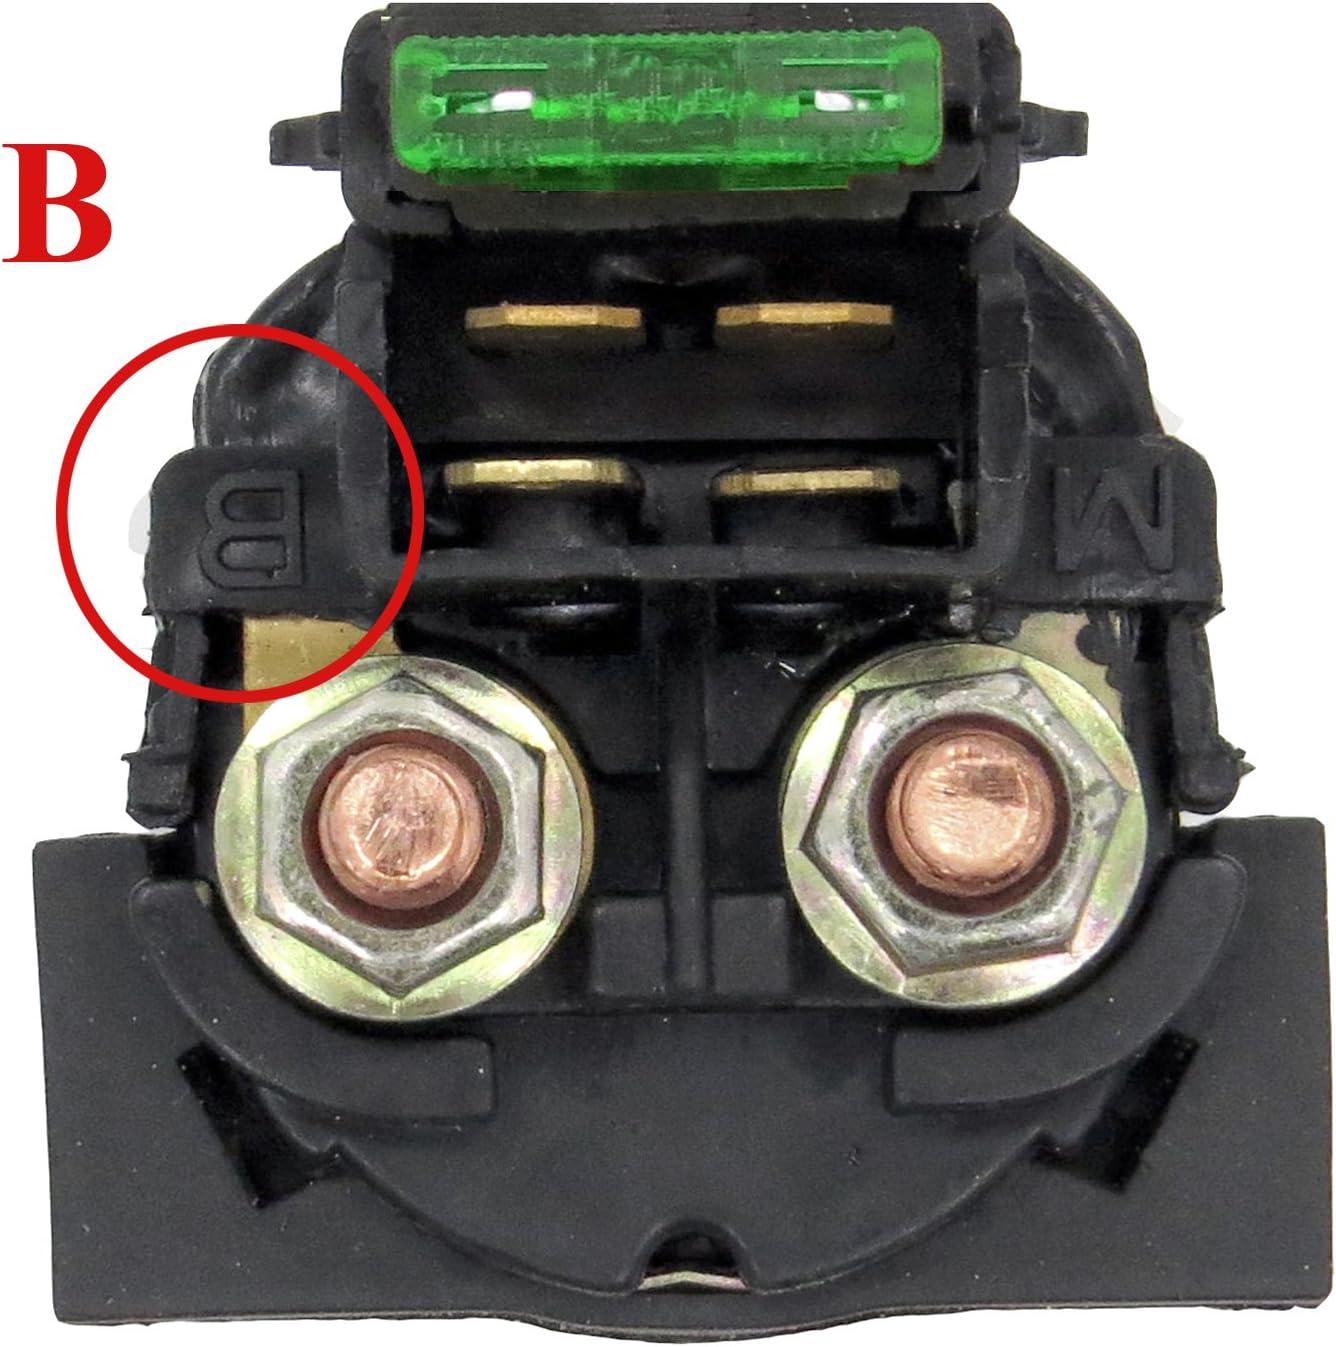 Starter Solenoid Relay Honda CRF230F CRF230 2003-2009 2012 2013-2014 //B